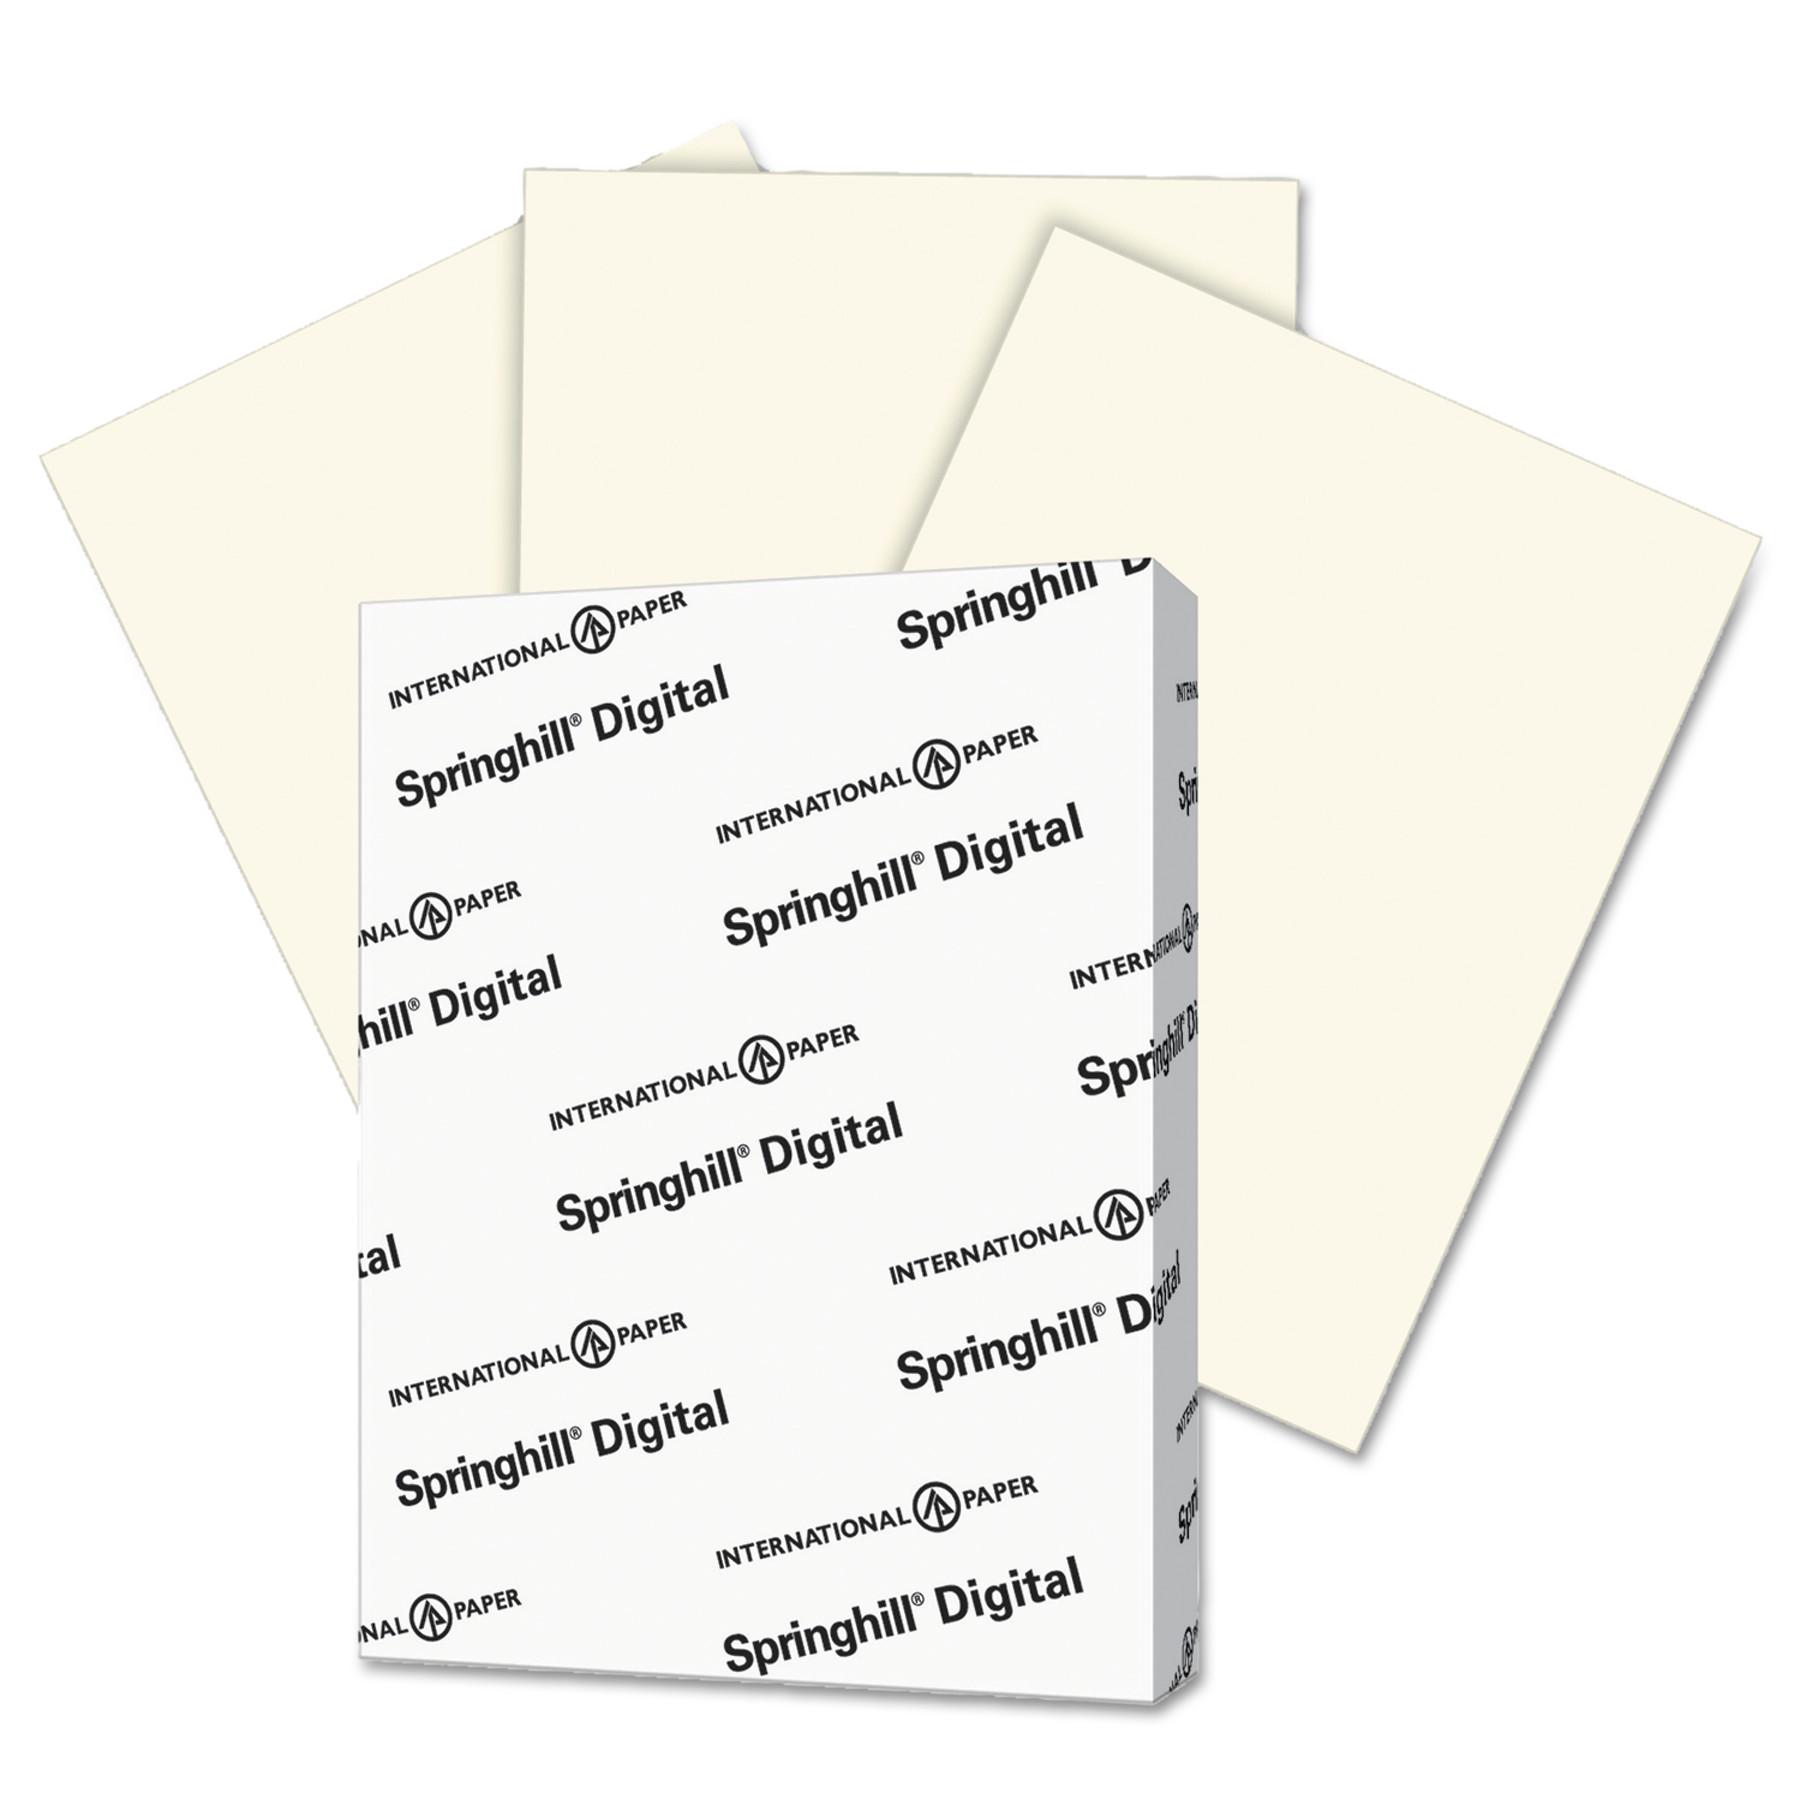 Springhill Digital Vellum Bristol Color Cover, 67 lb, 8 1/2 x 11, Cream, 250 Sheets/Pack -SGH097000